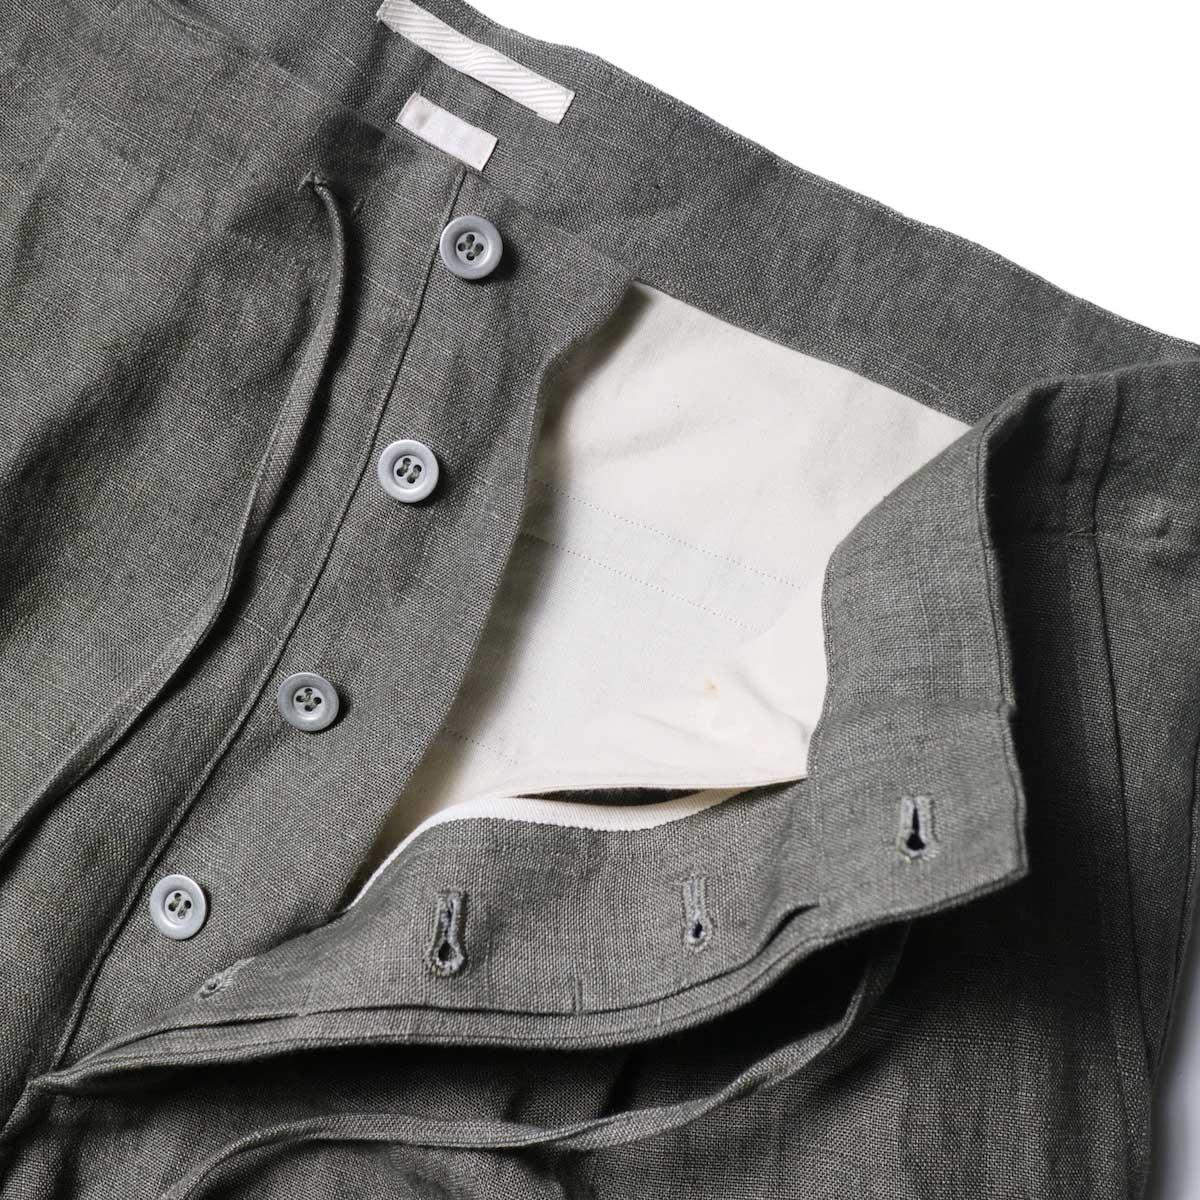 Blurhms / Wash Linen 5P Easy Pants (KhakiGrey)ボタンフライ